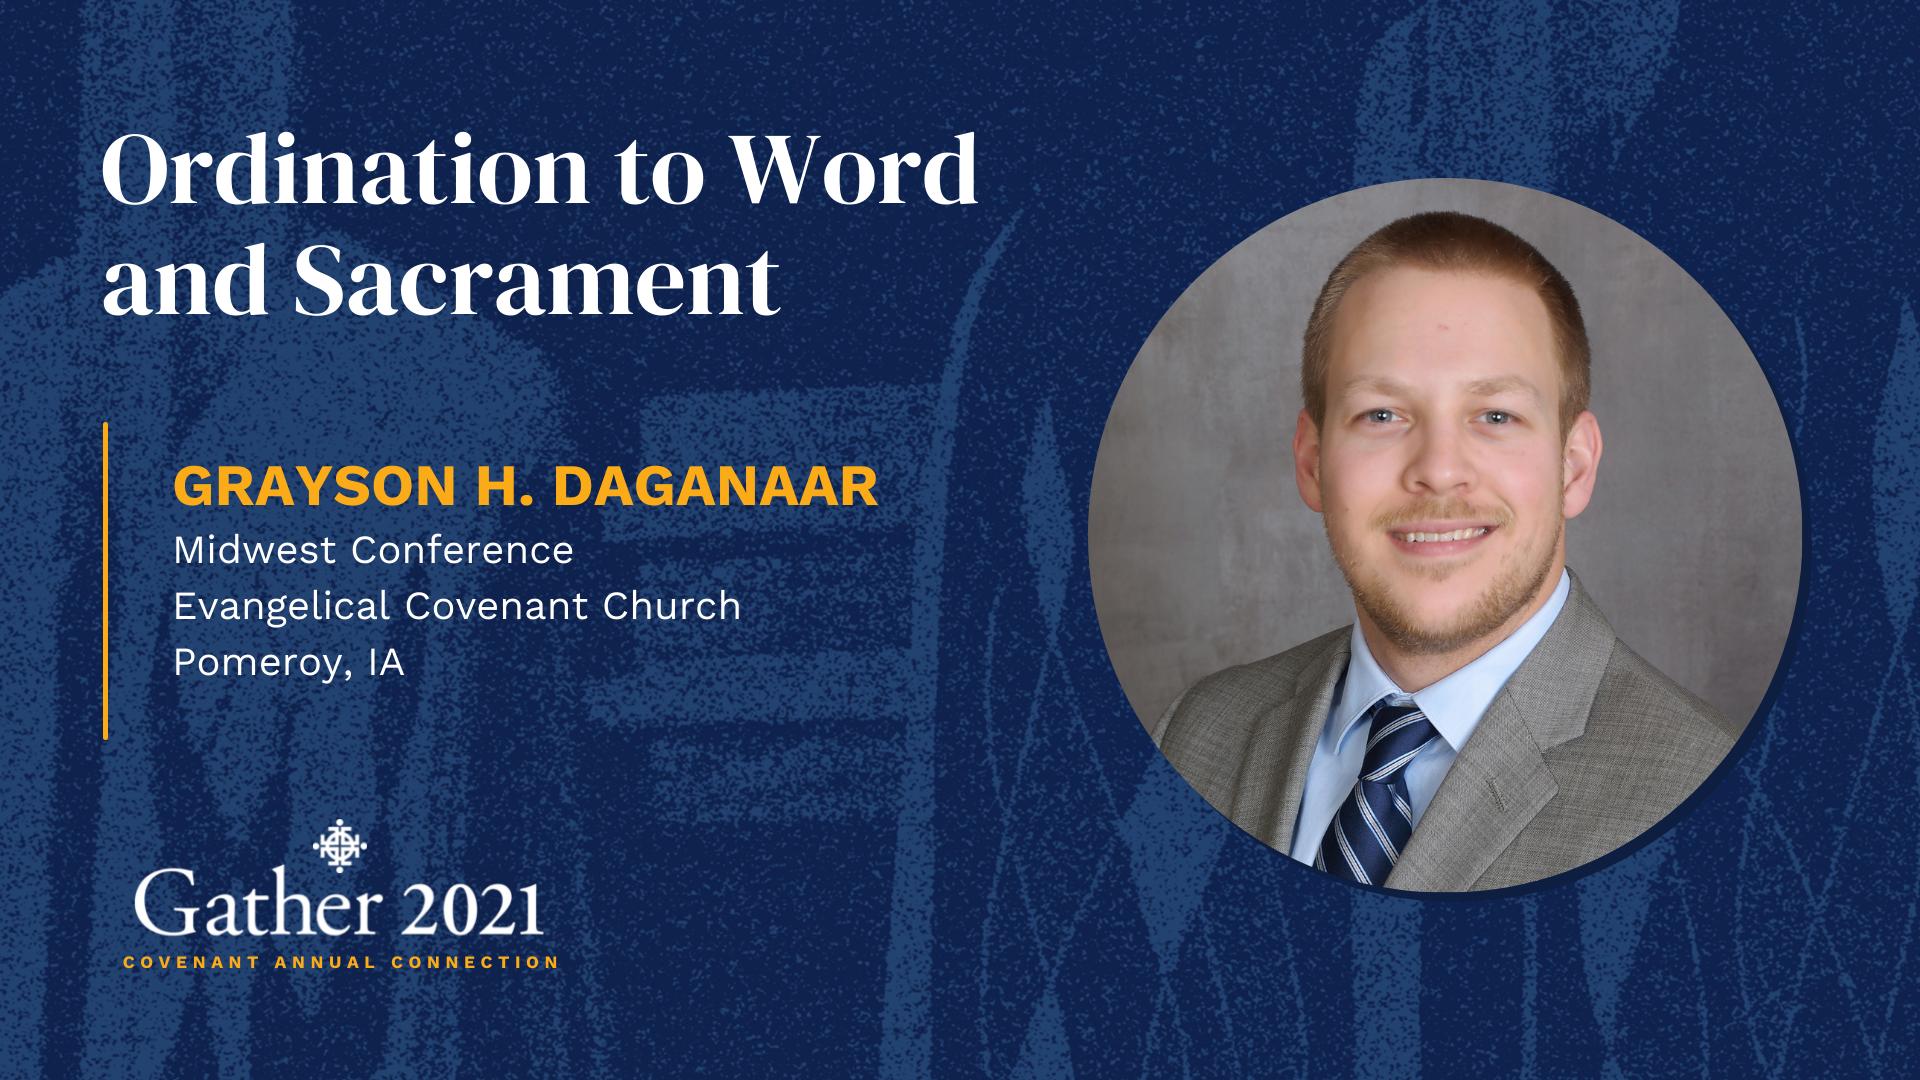 Grayson H. Daganaar